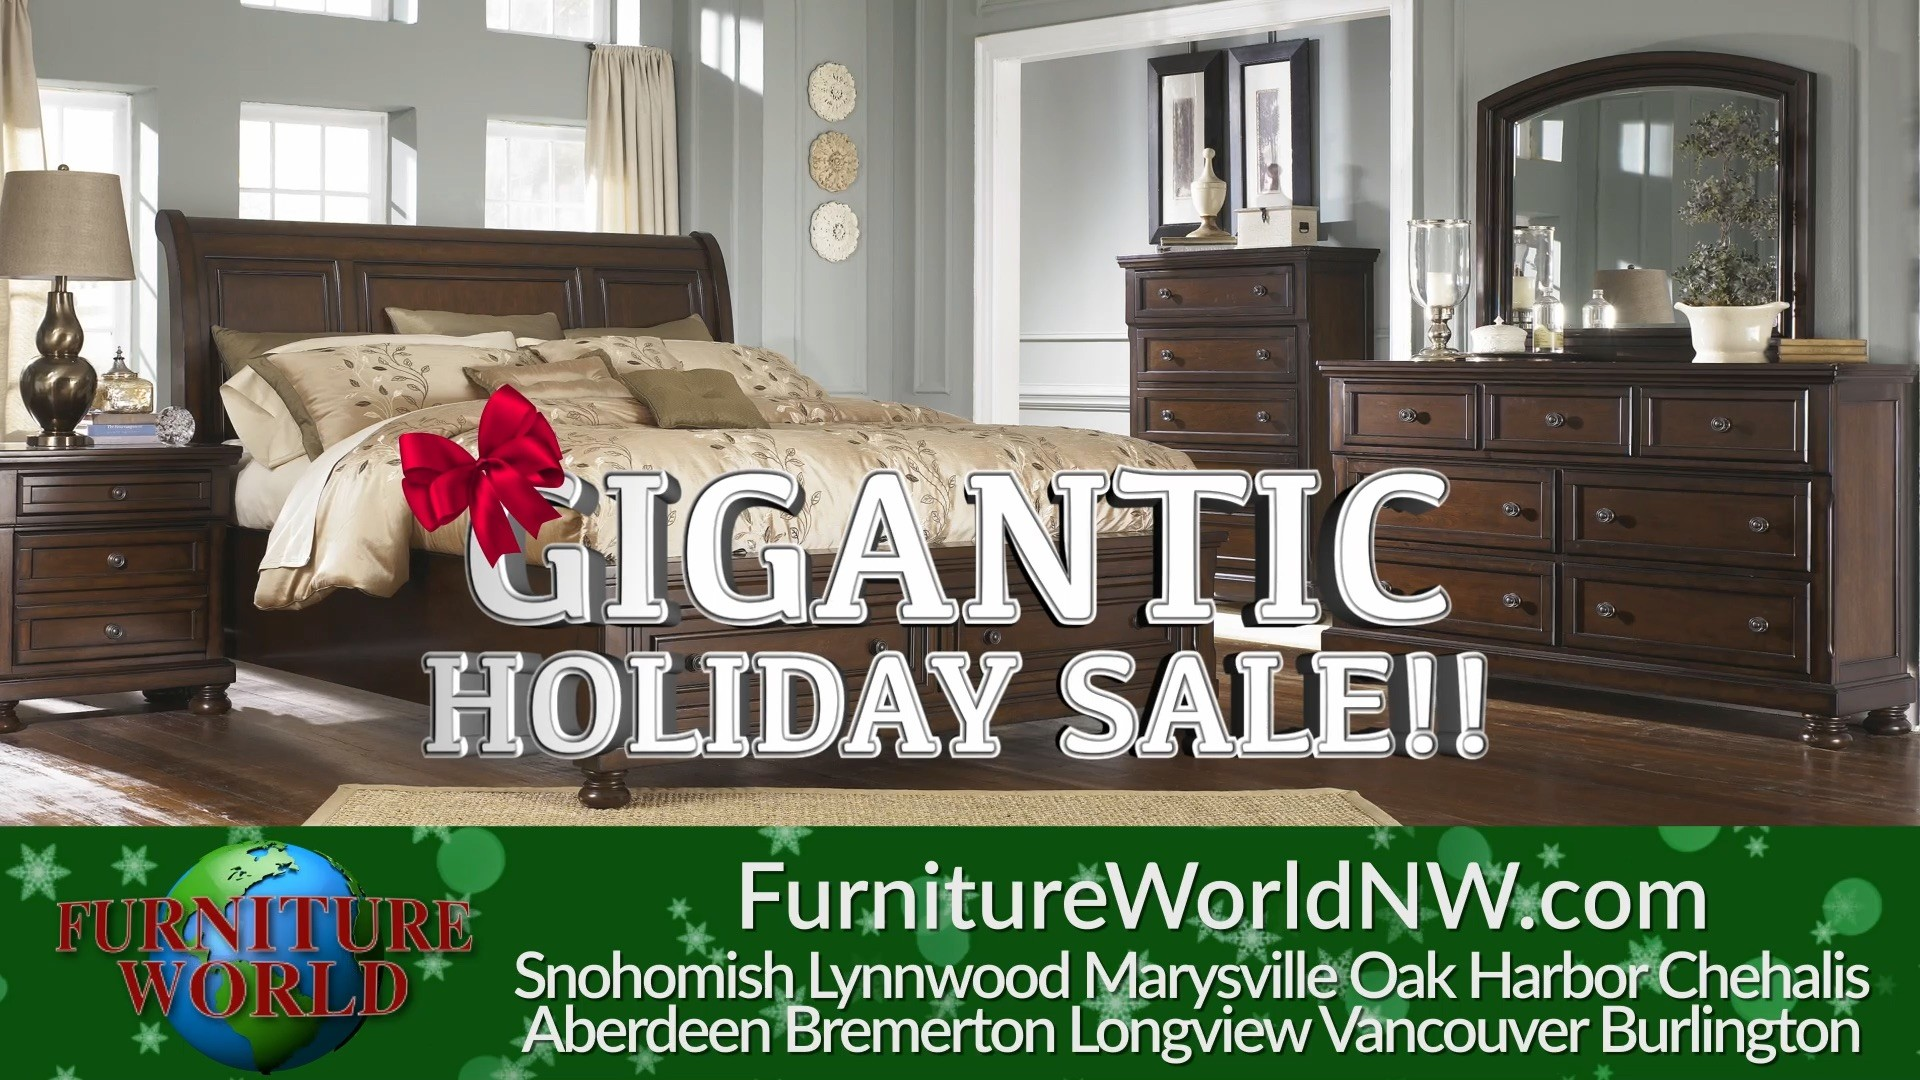 Furniture World: December Holiday Credit